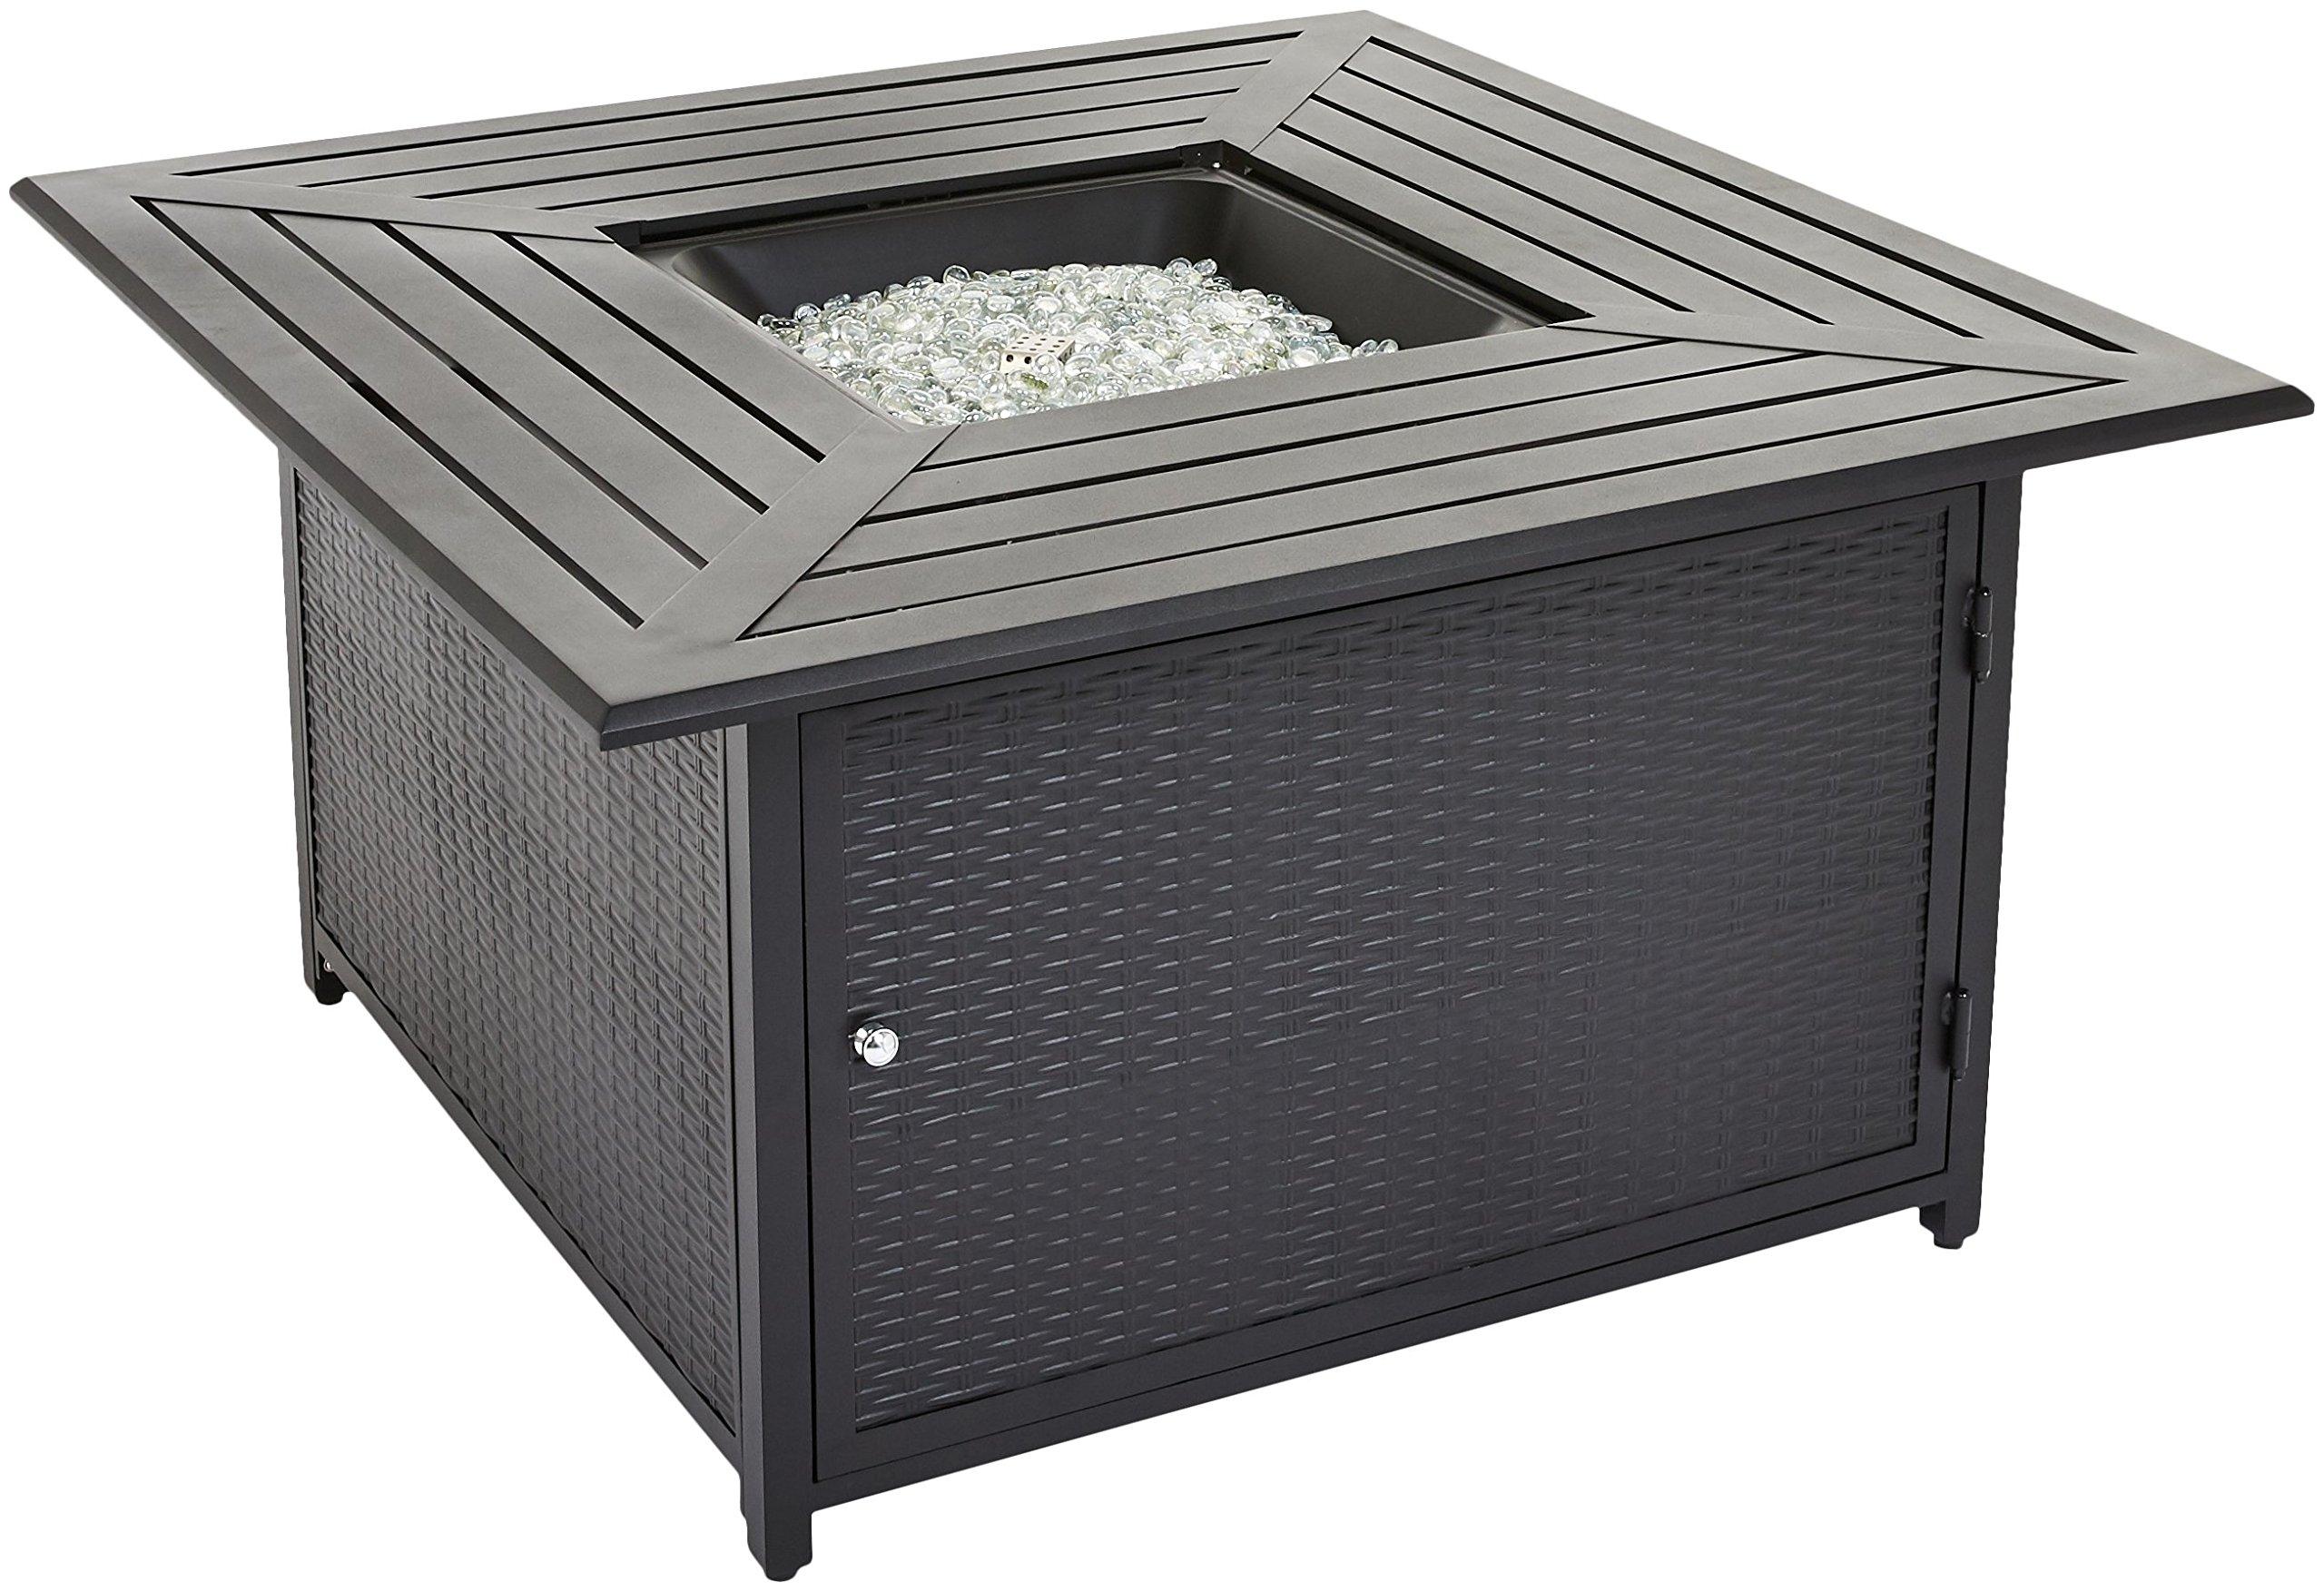 AmazonBasics Outdoor Patio Propane Table Fire Pit, Black